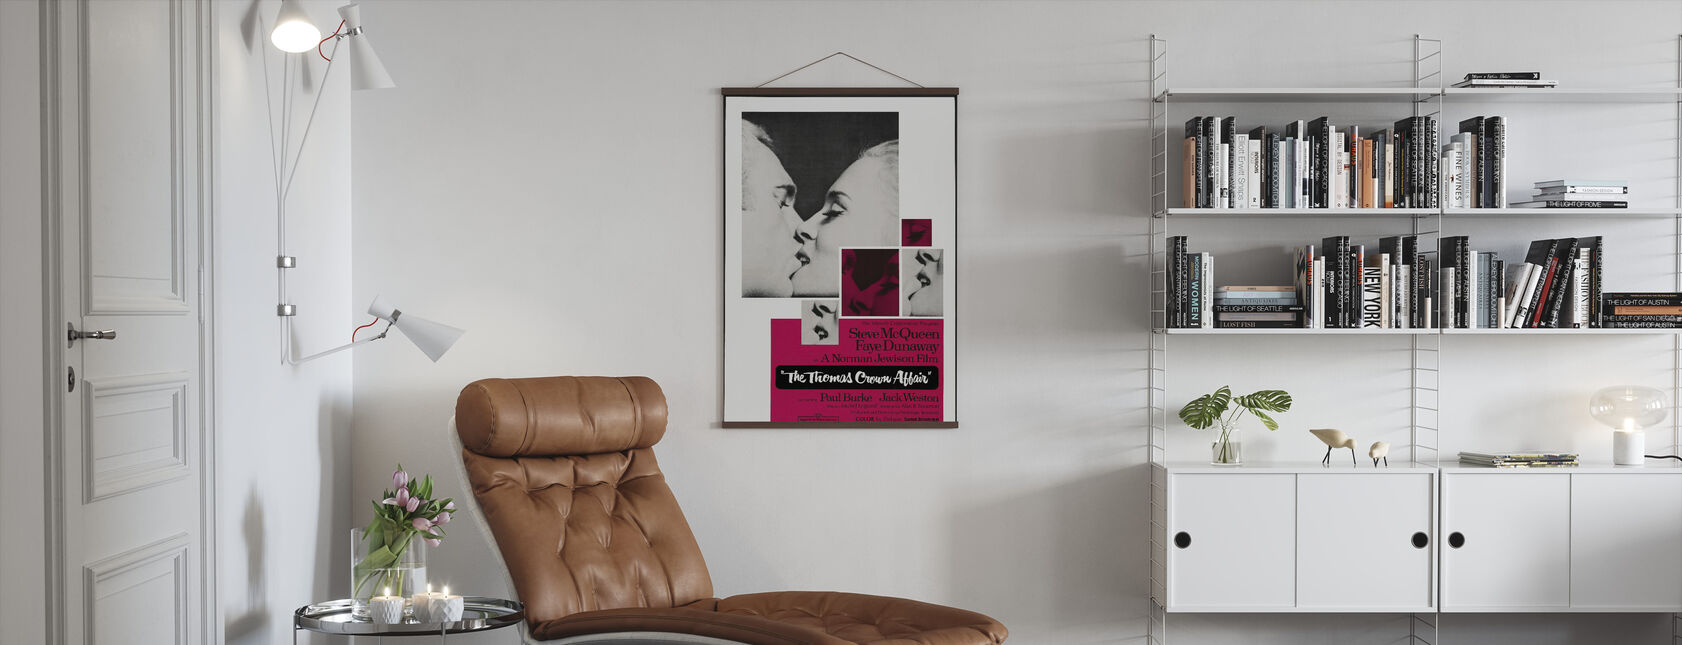 Thomas Crown Affair - Poster - Living Room